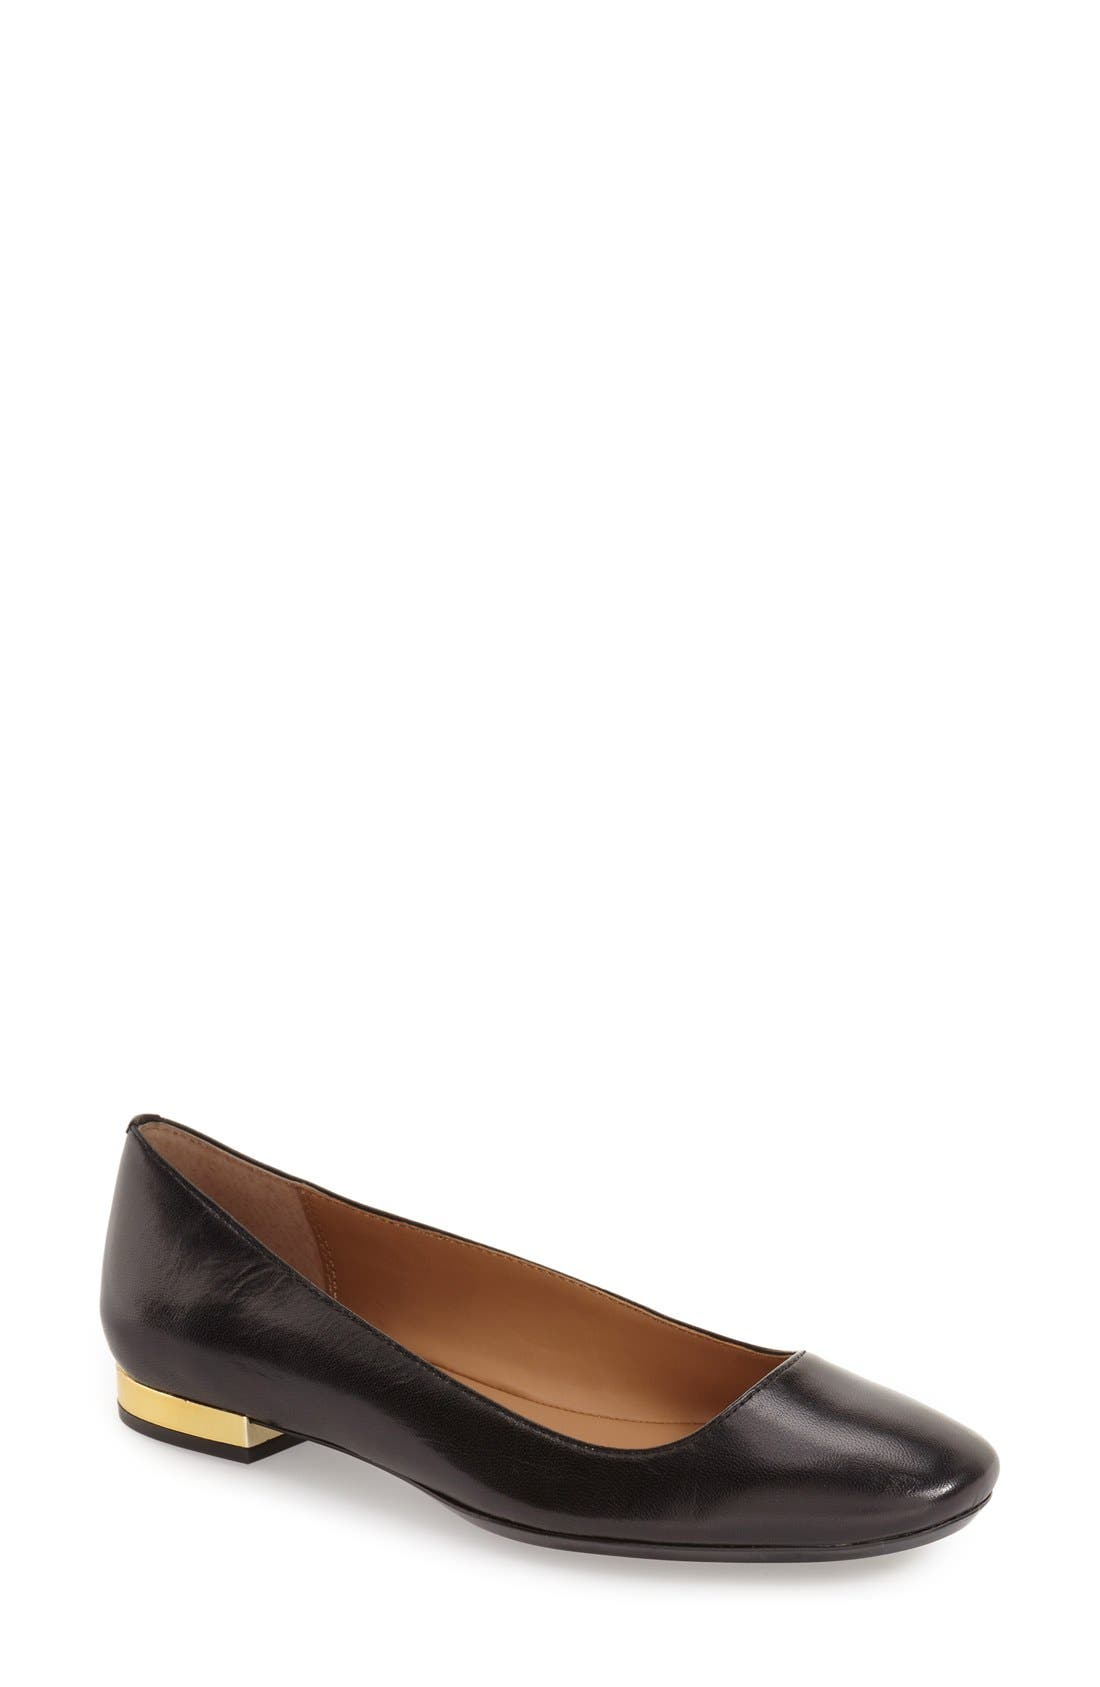 b837d298064 Calvin Klein Women s Shoes